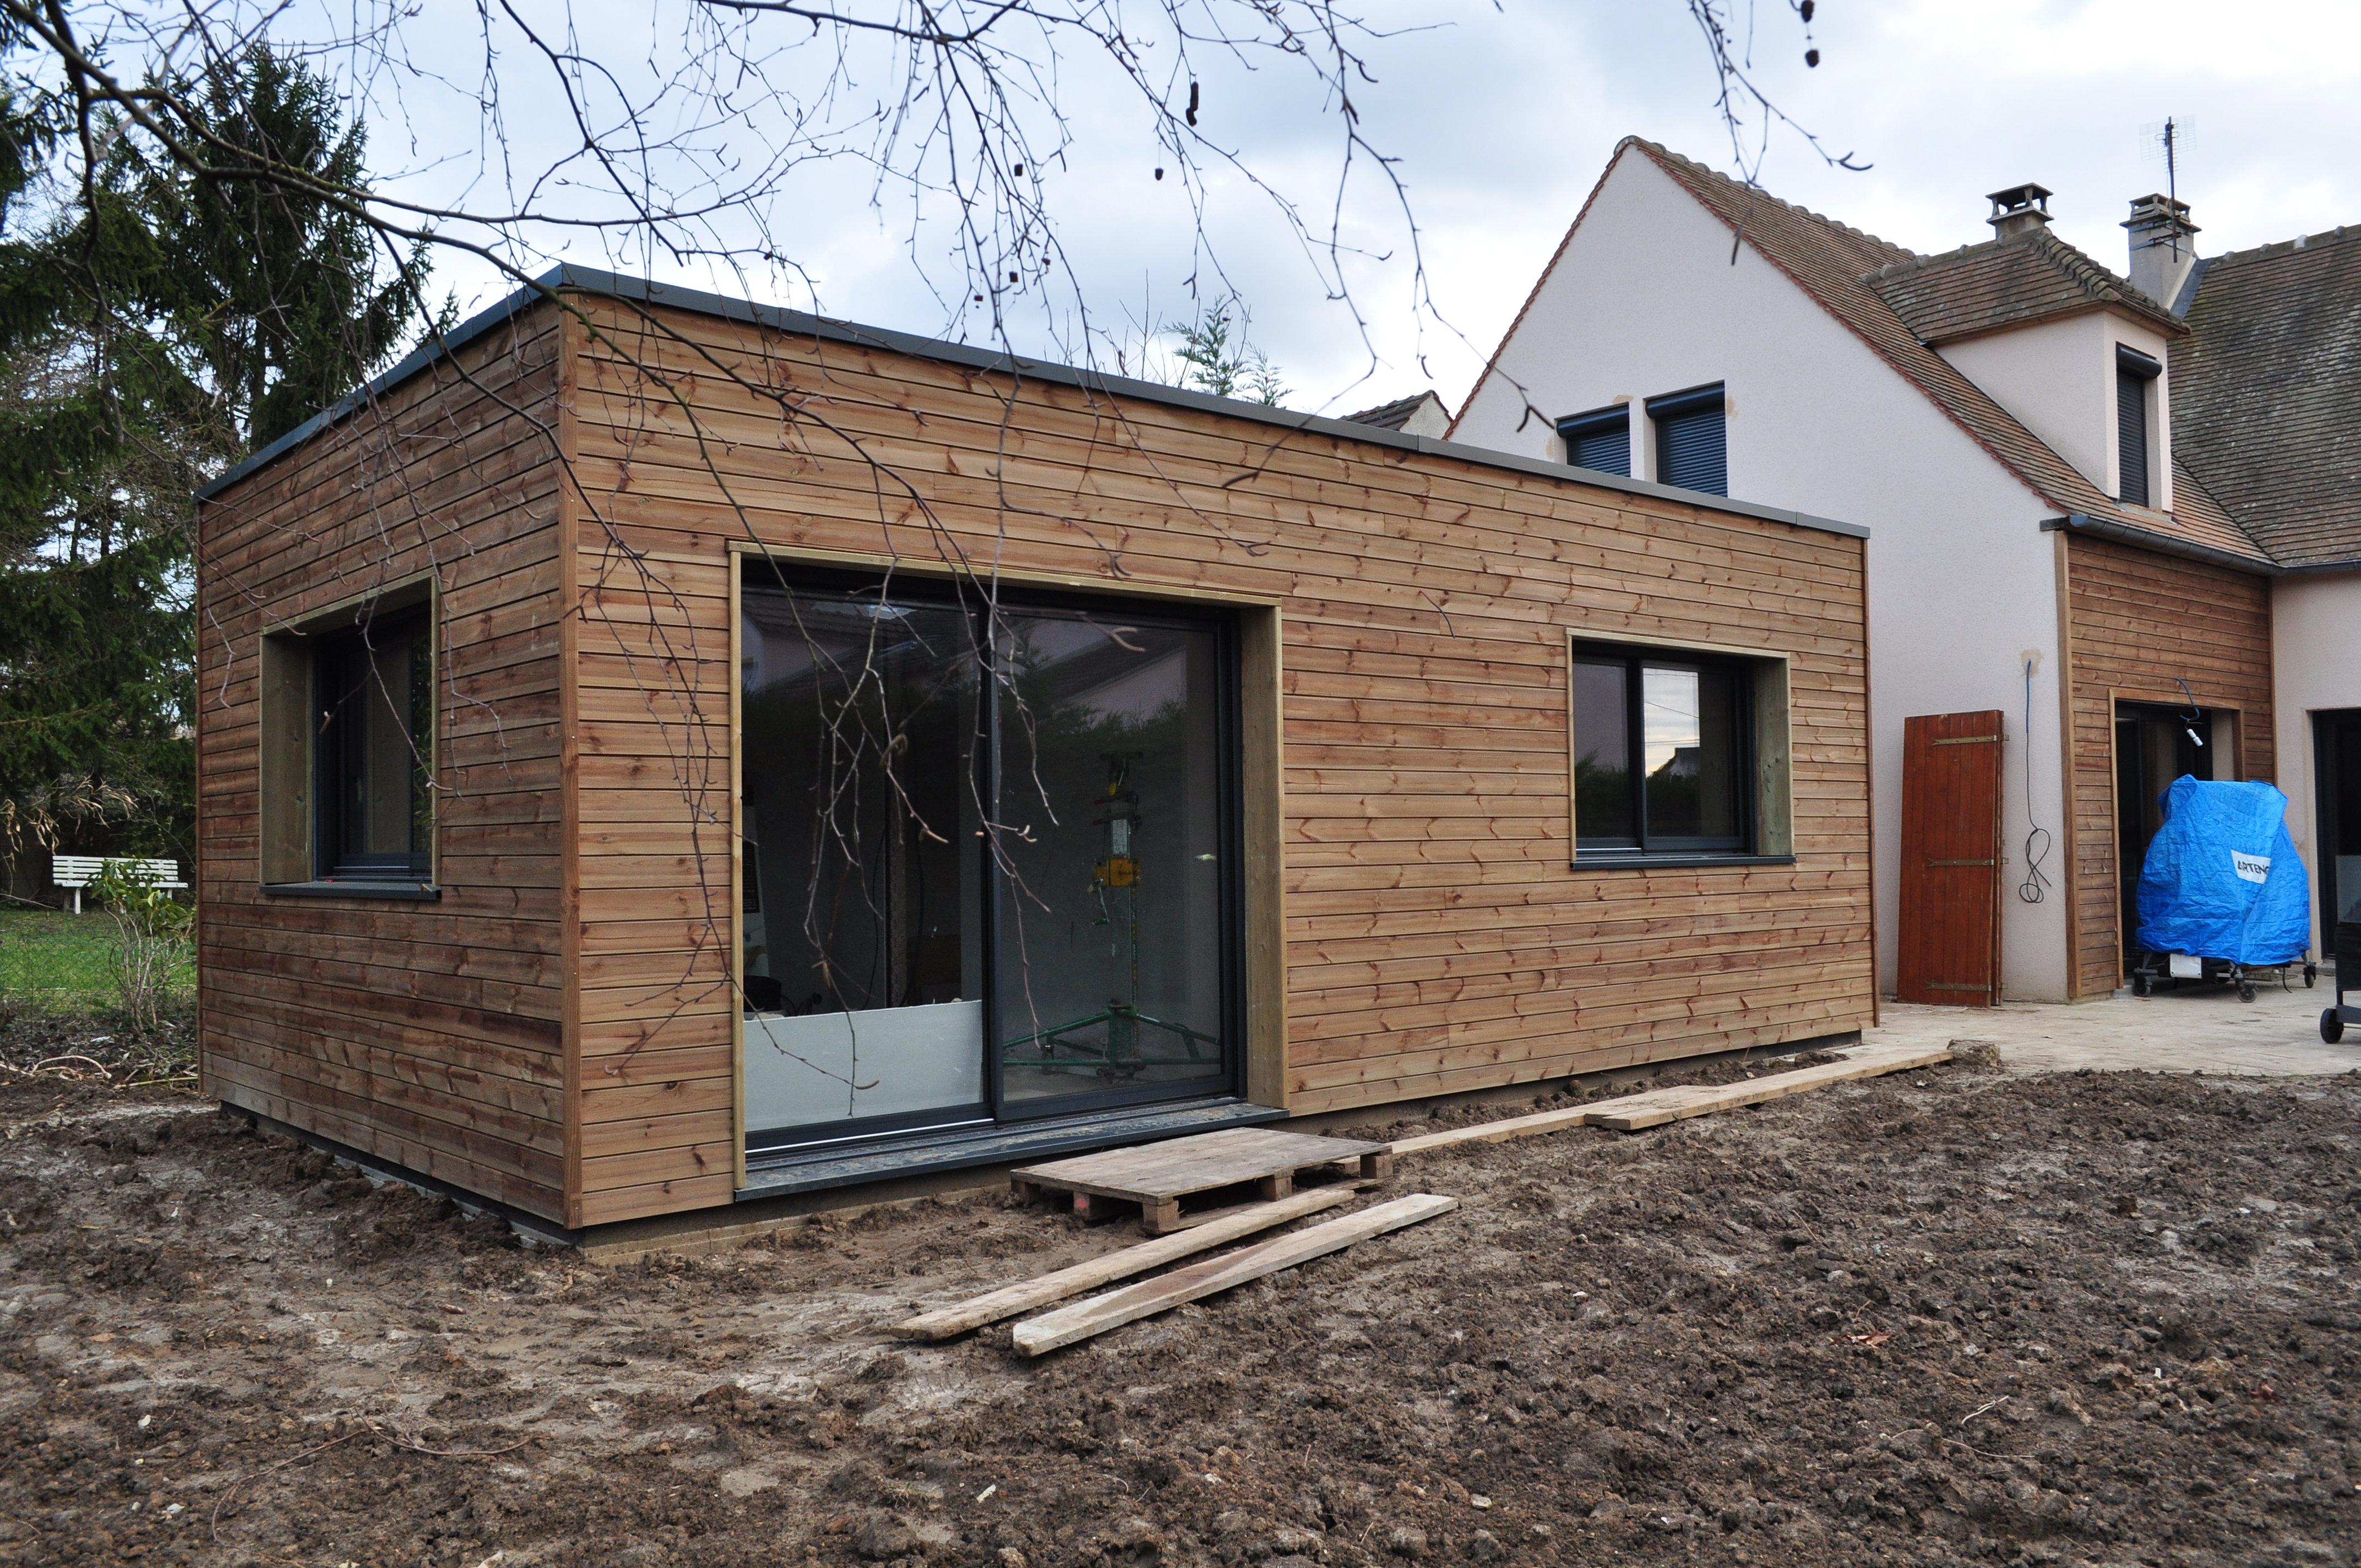 extension bois toit plat best maison with extension bois toit plat simple extension bois vue. Black Bedroom Furniture Sets. Home Design Ideas